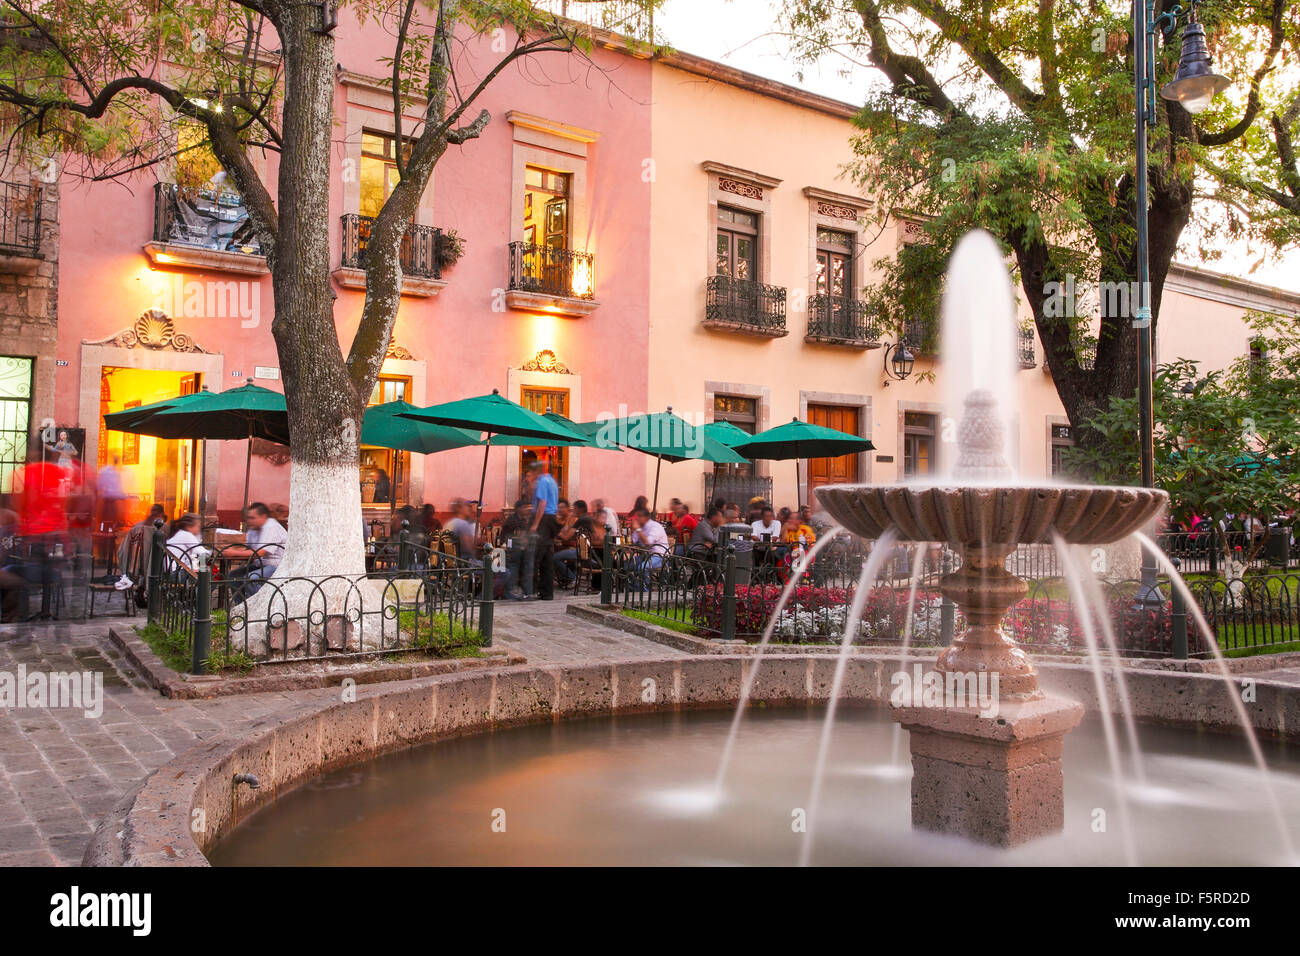 Outdoor cafes line the park across from the Conservatorio de las Rosas in Morelia, Michoacan, Mexico. - Stock Image